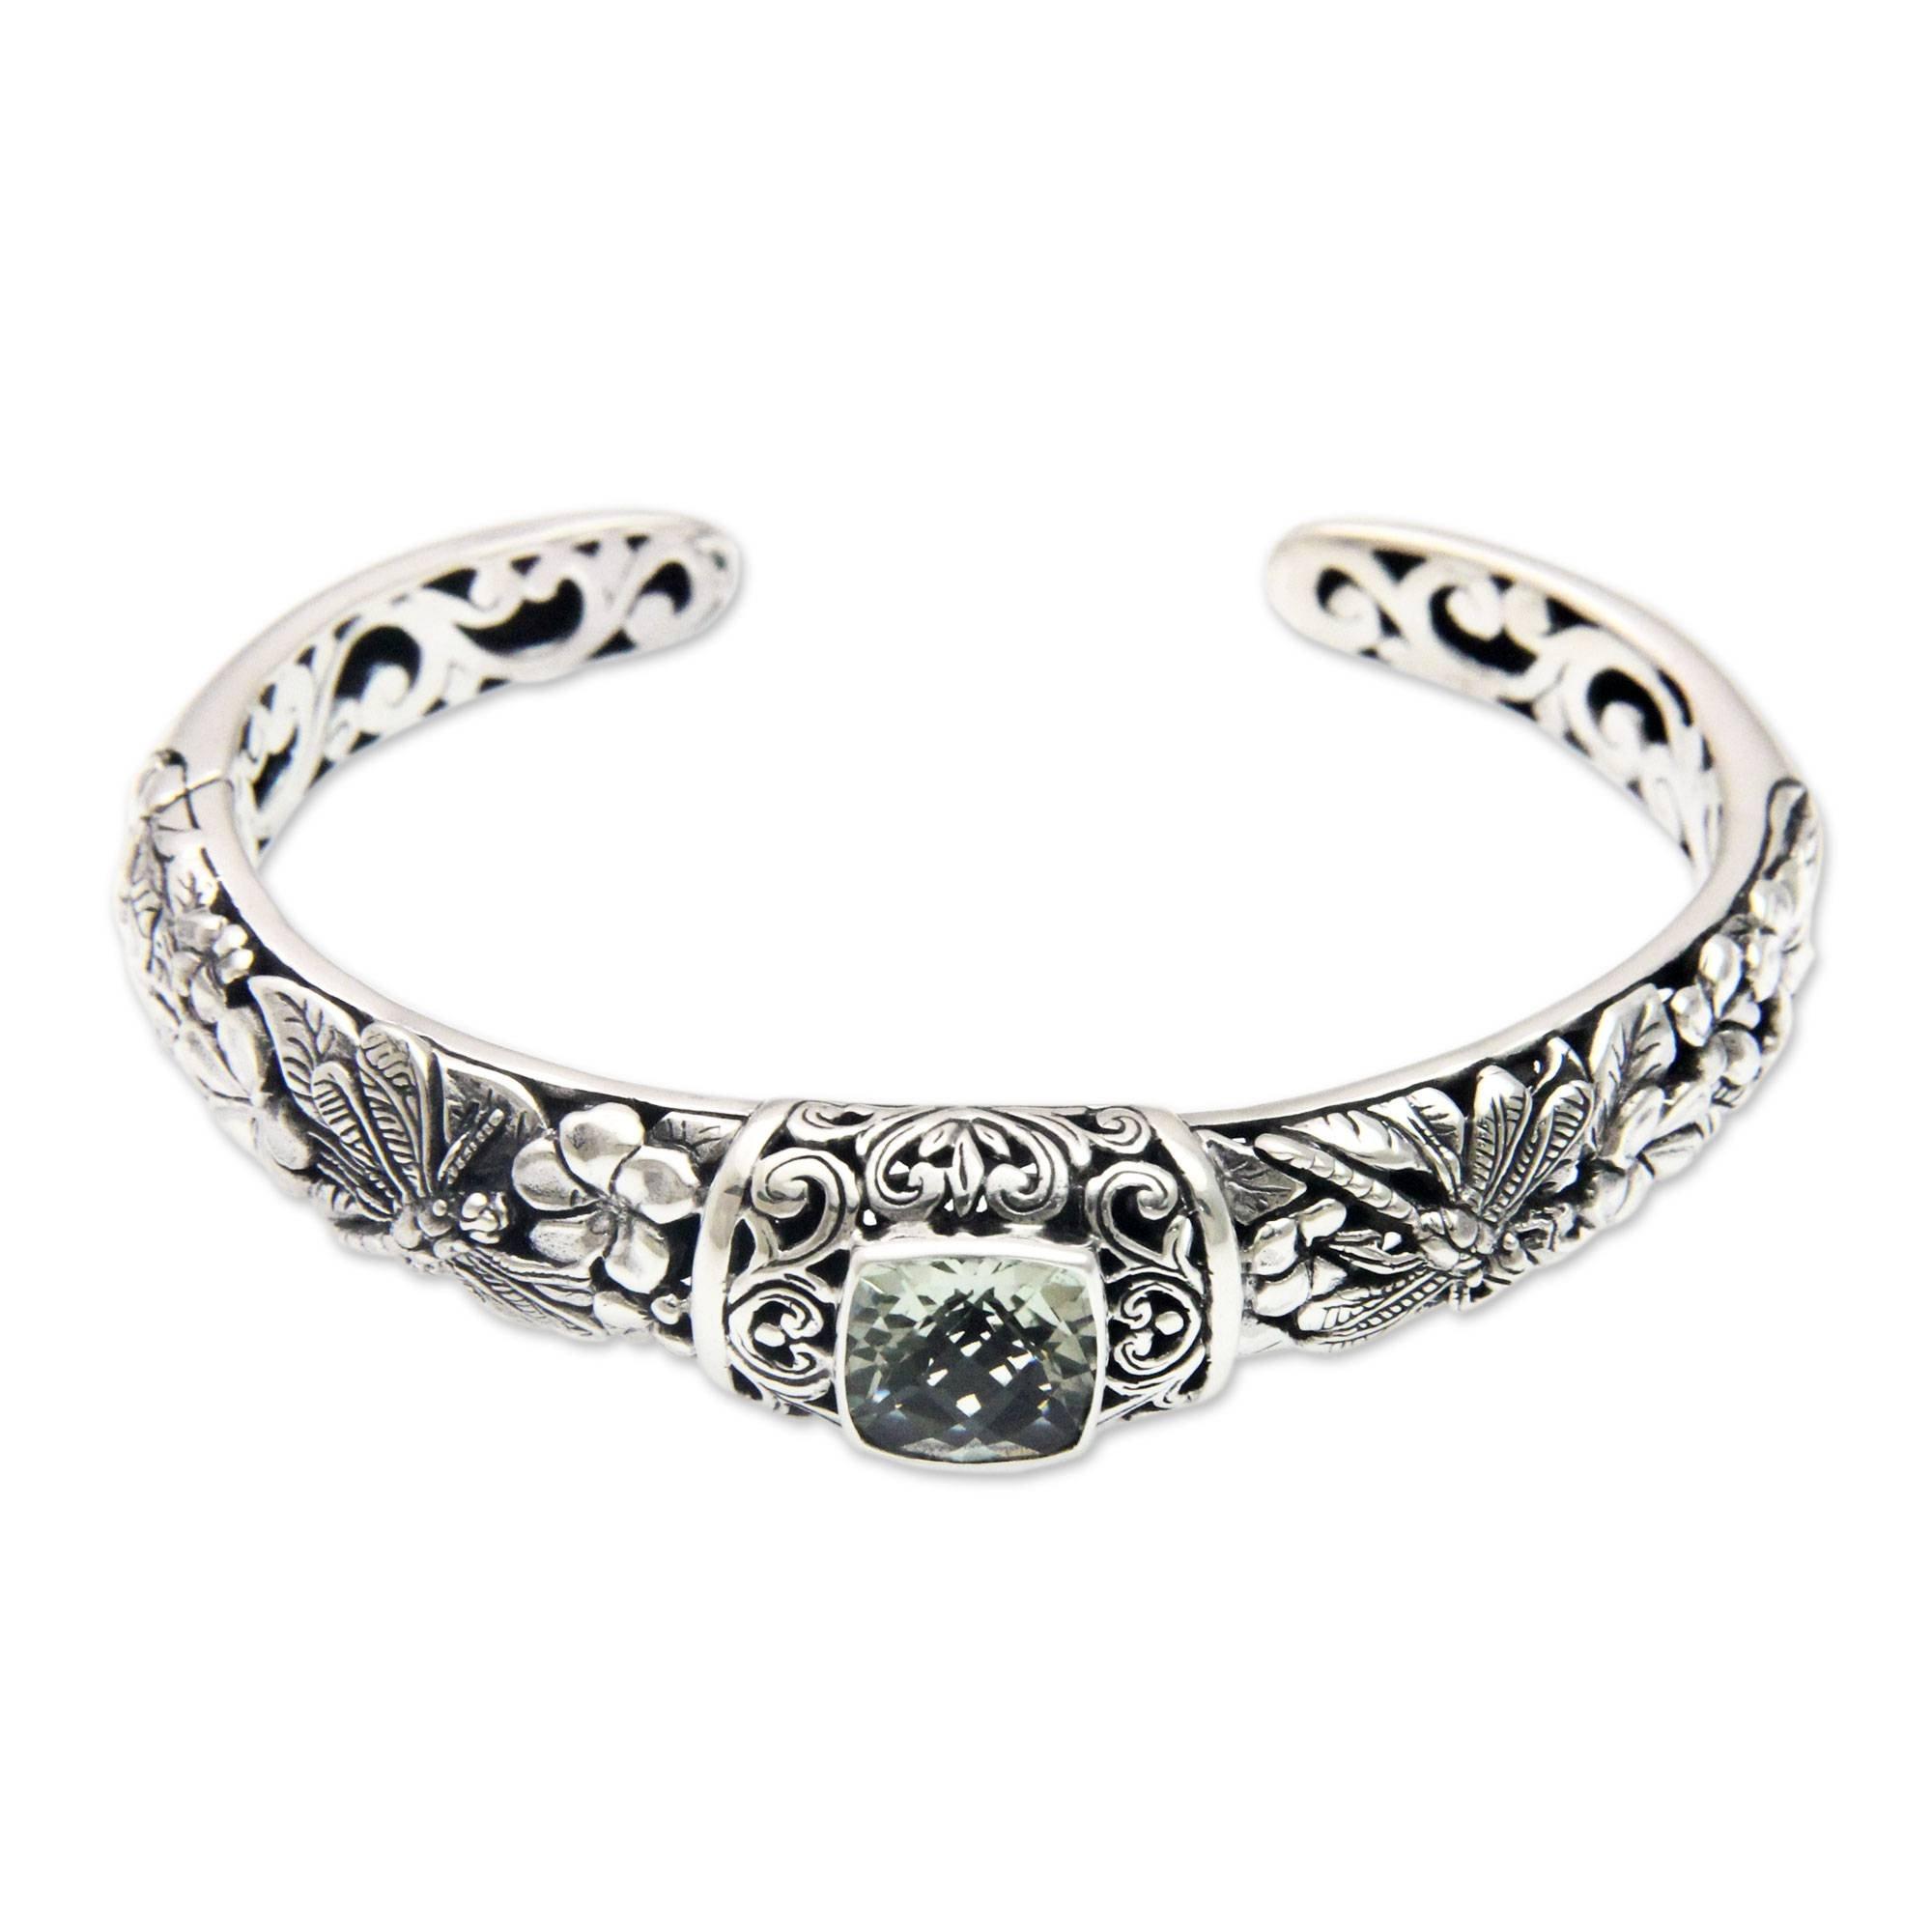 NOVICA Prasiolite .925 Sterling Silver Cuff Bracelet 'Dragonfly Frangipanis' by NOVICA